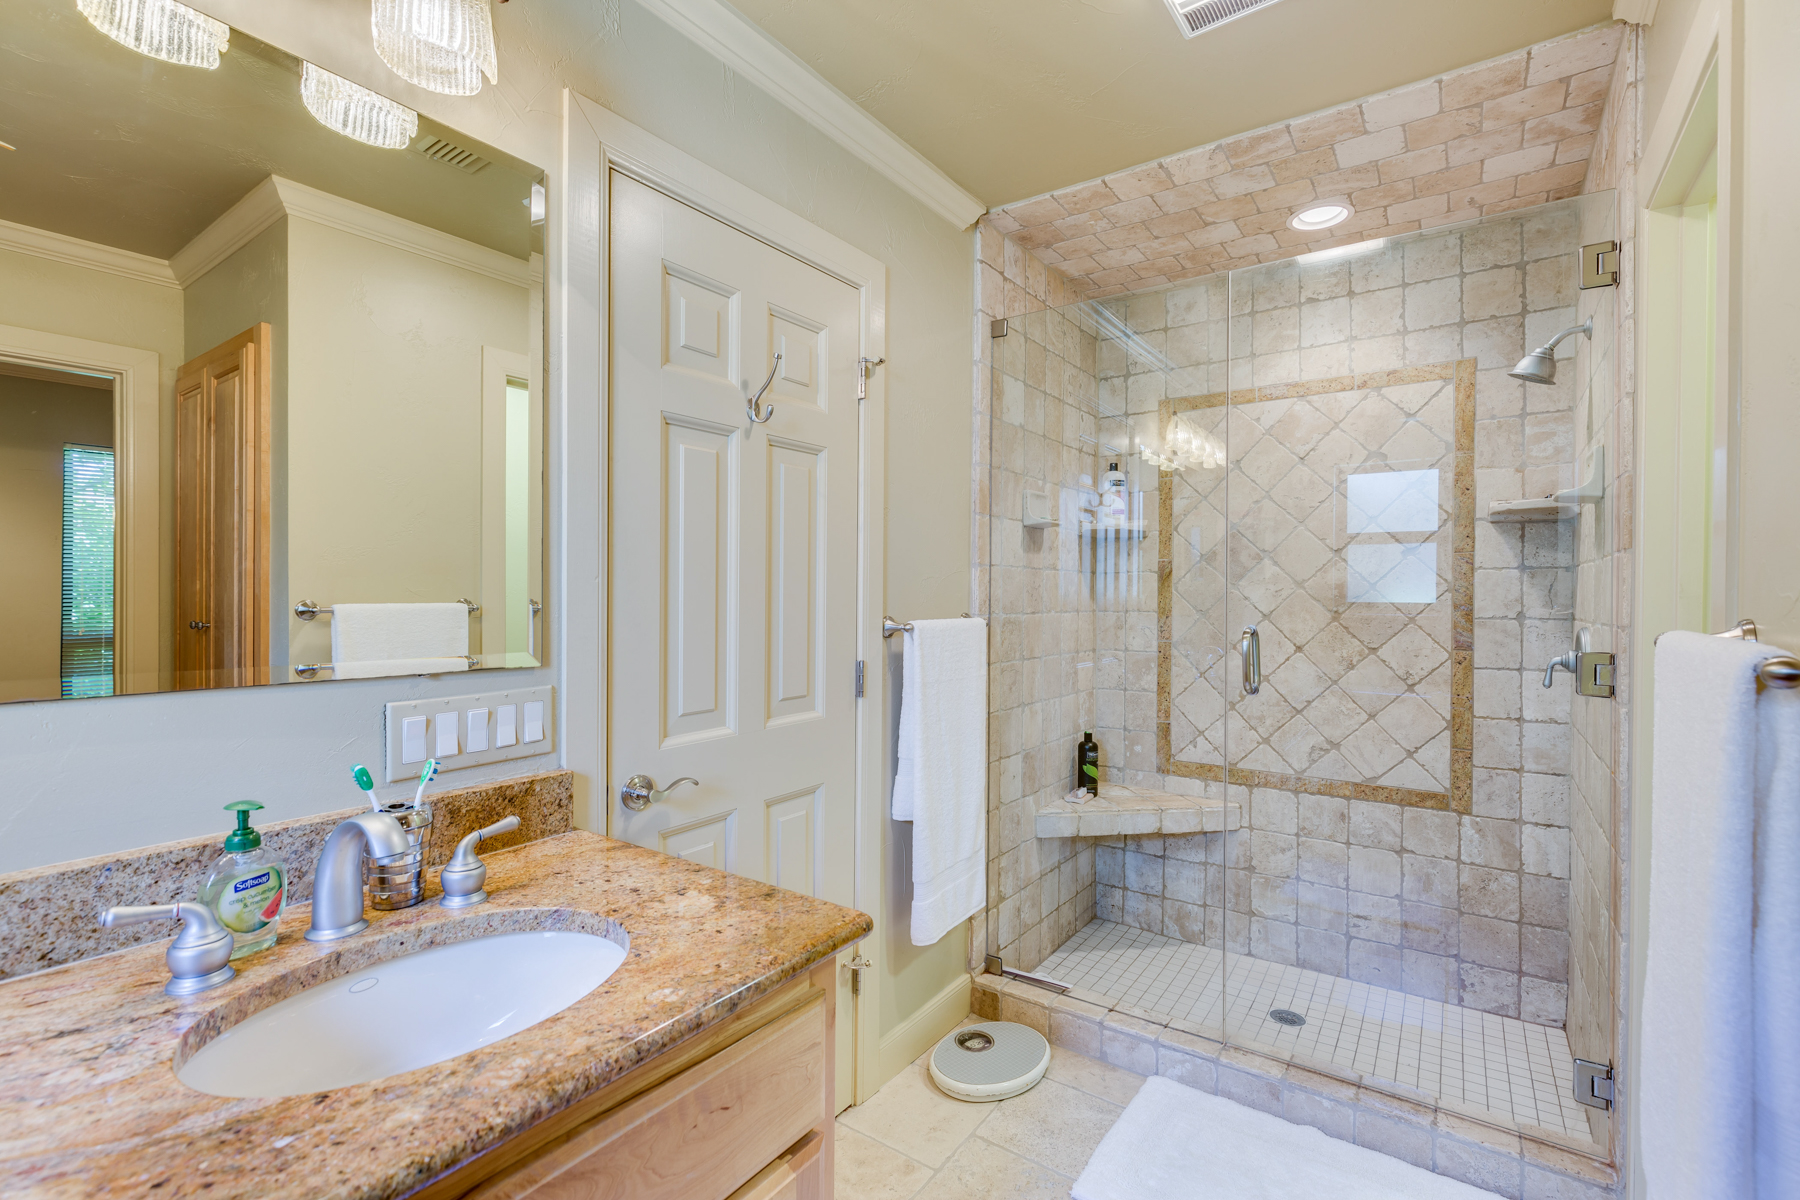 Additional photo for property listing at Spectacular Property in Boerne 141 Cascade Caverns Rd Boerne, Texas 78006 Estados Unidos